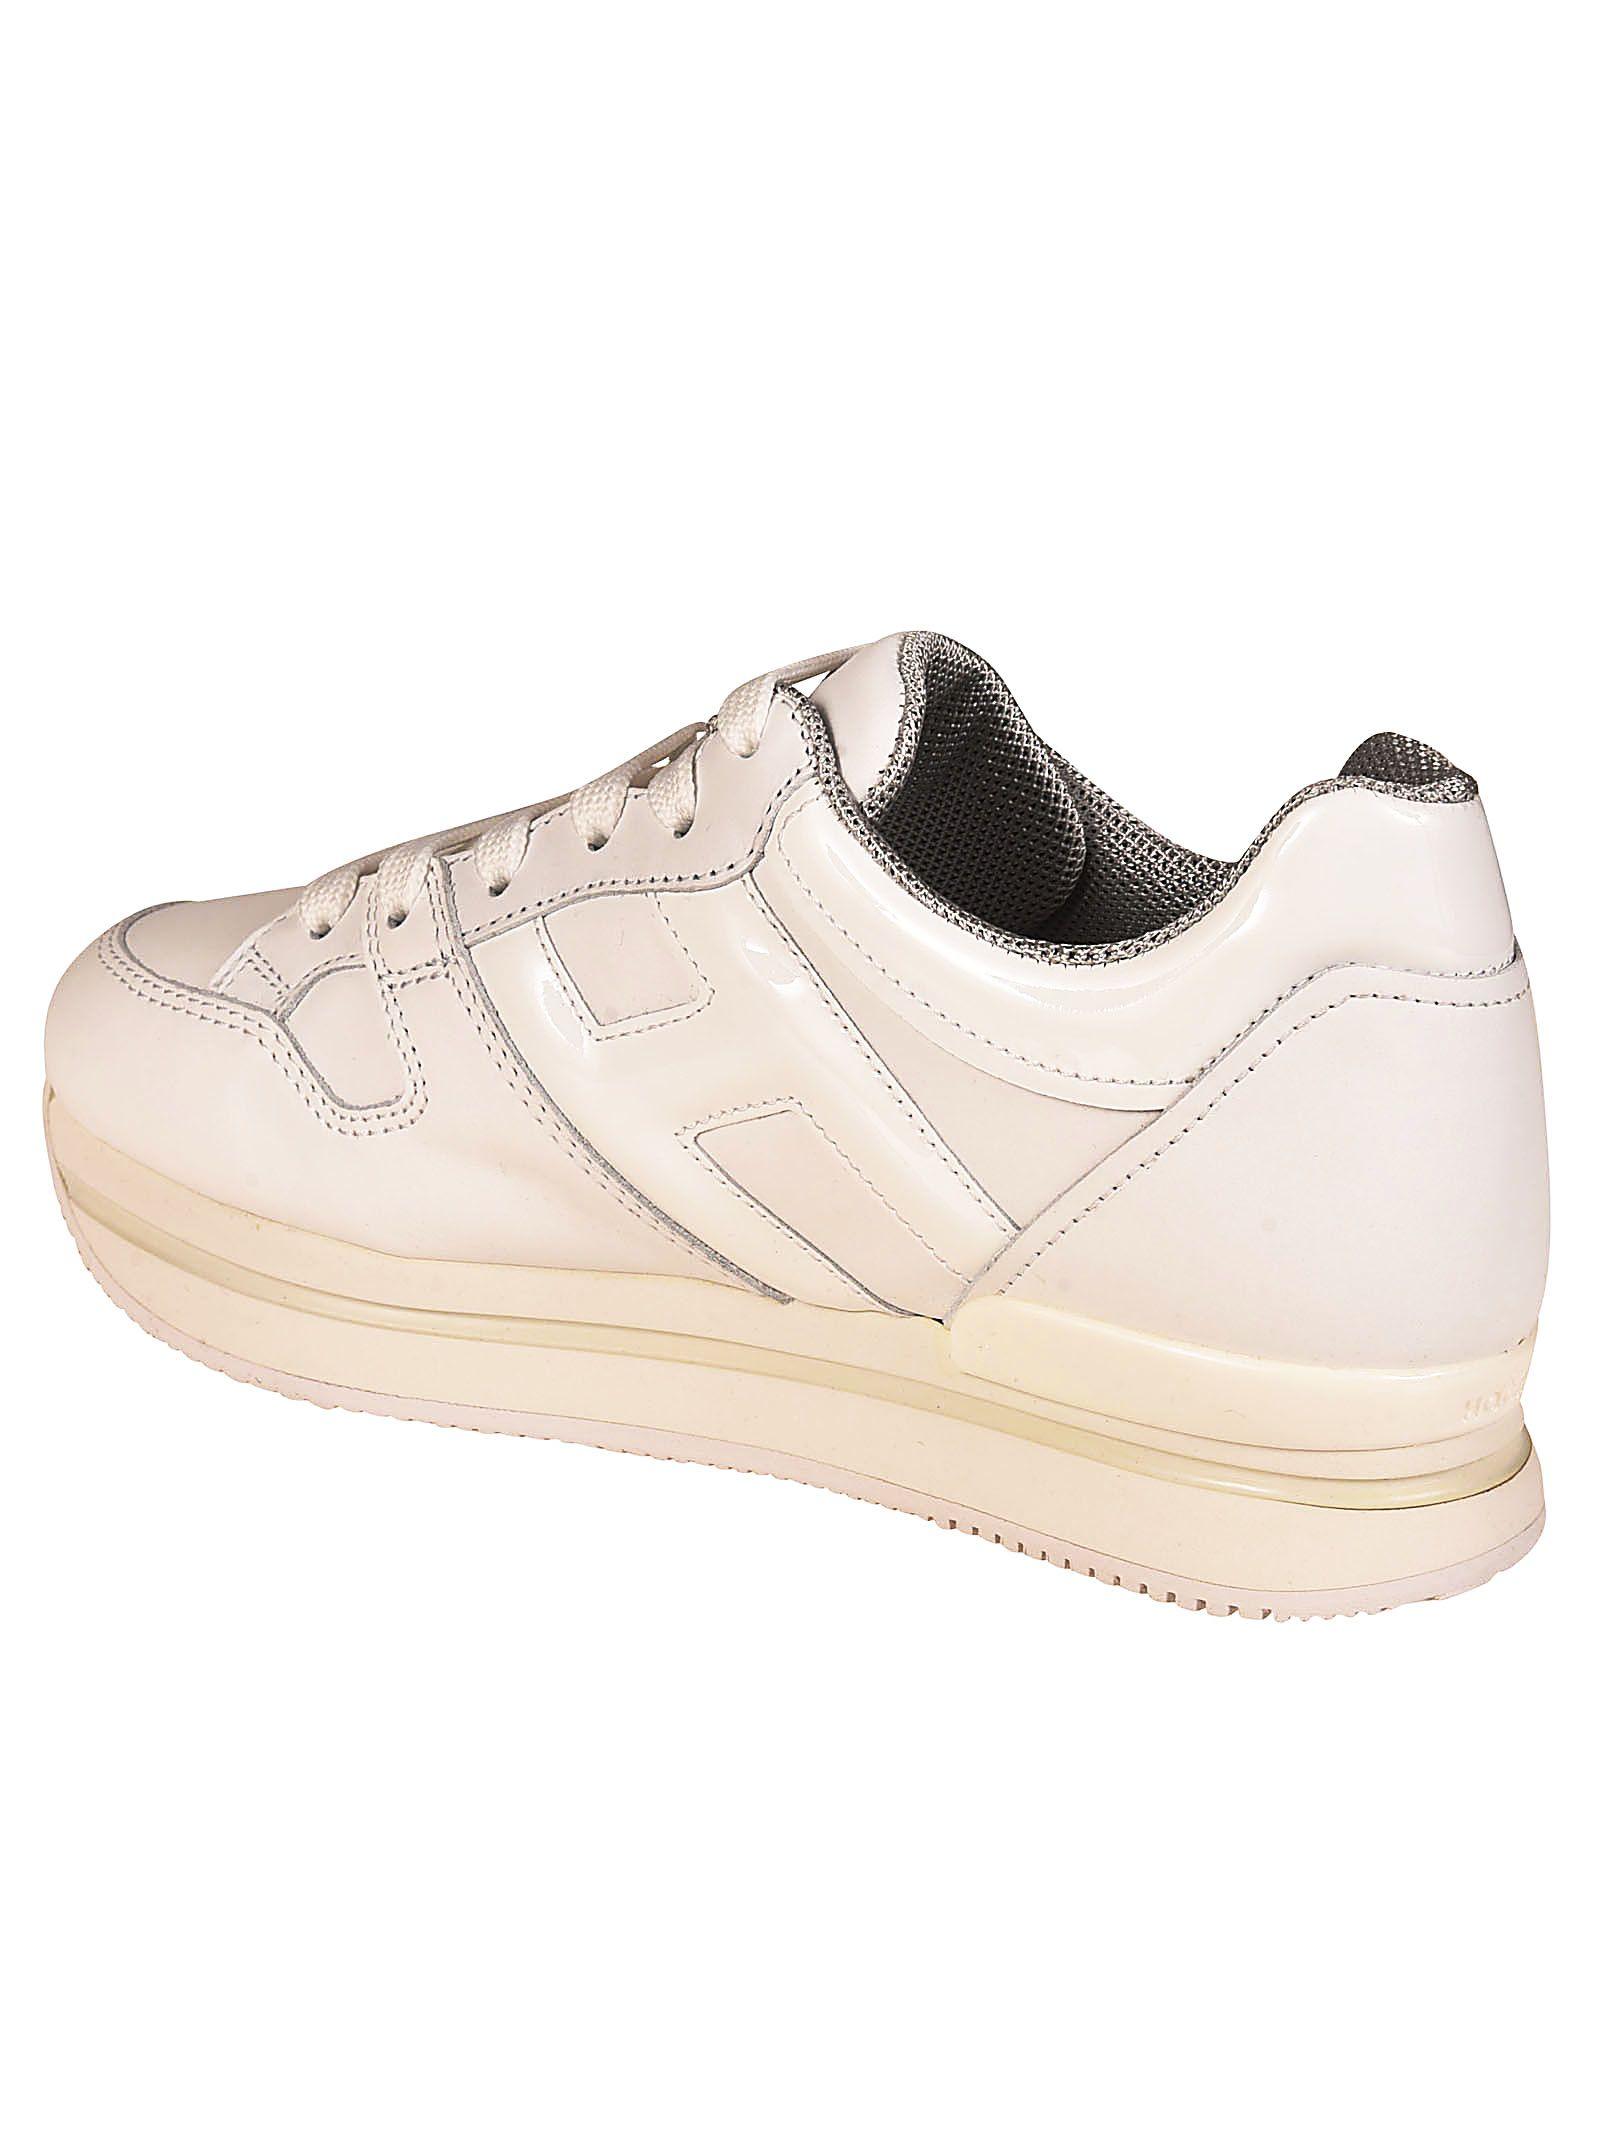 Discount Big Sale Hogan H222 Allaciato H Grande Sneakers Sale Many Kinds Of Buy Cheap Great Deals SiLWkaJAZ